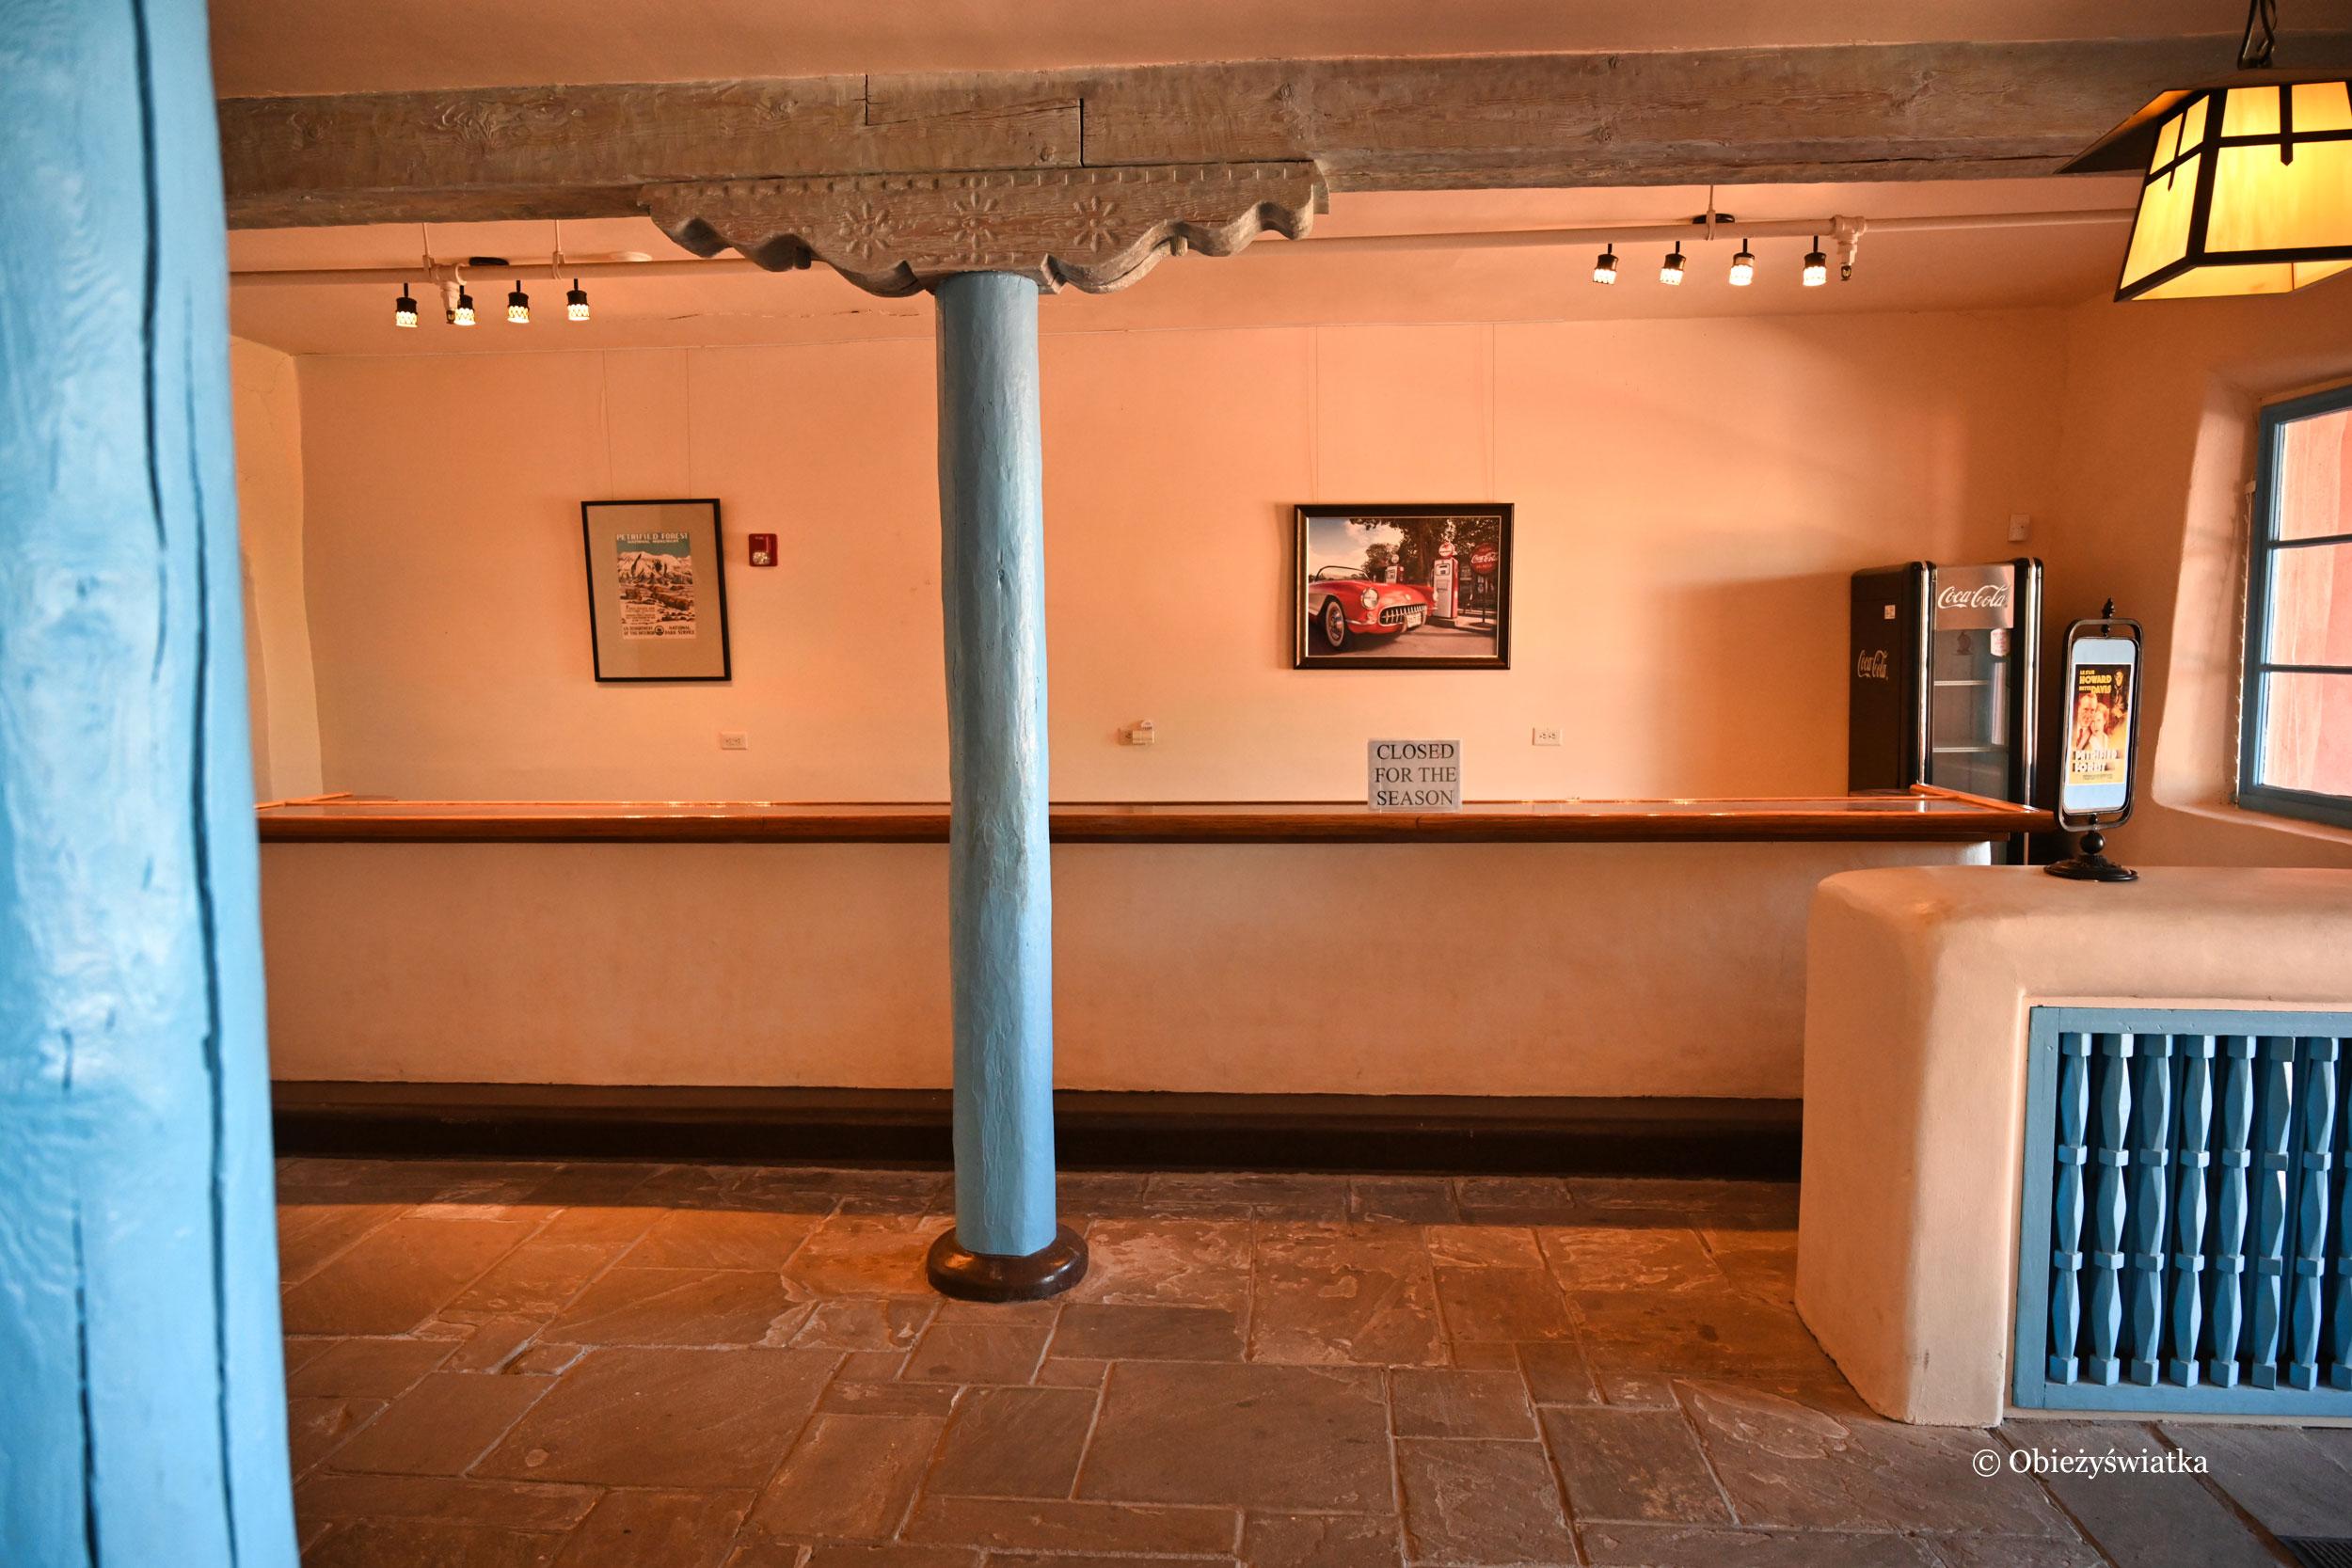 Painted Desert Inn - dziś to małe muzeum